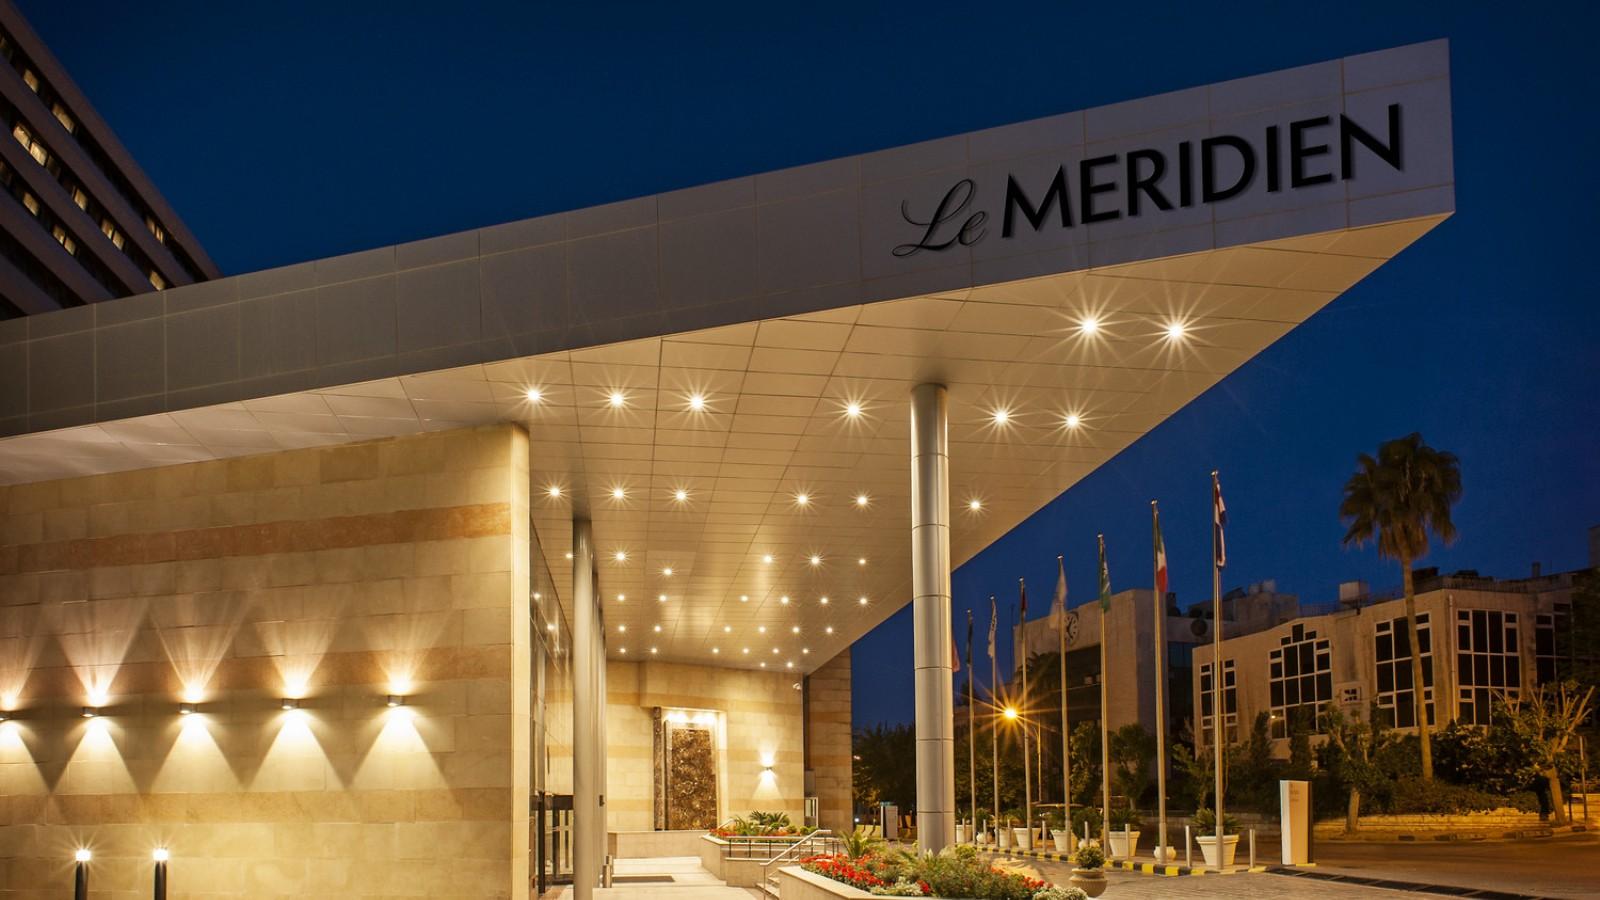 Le Merin Hotel